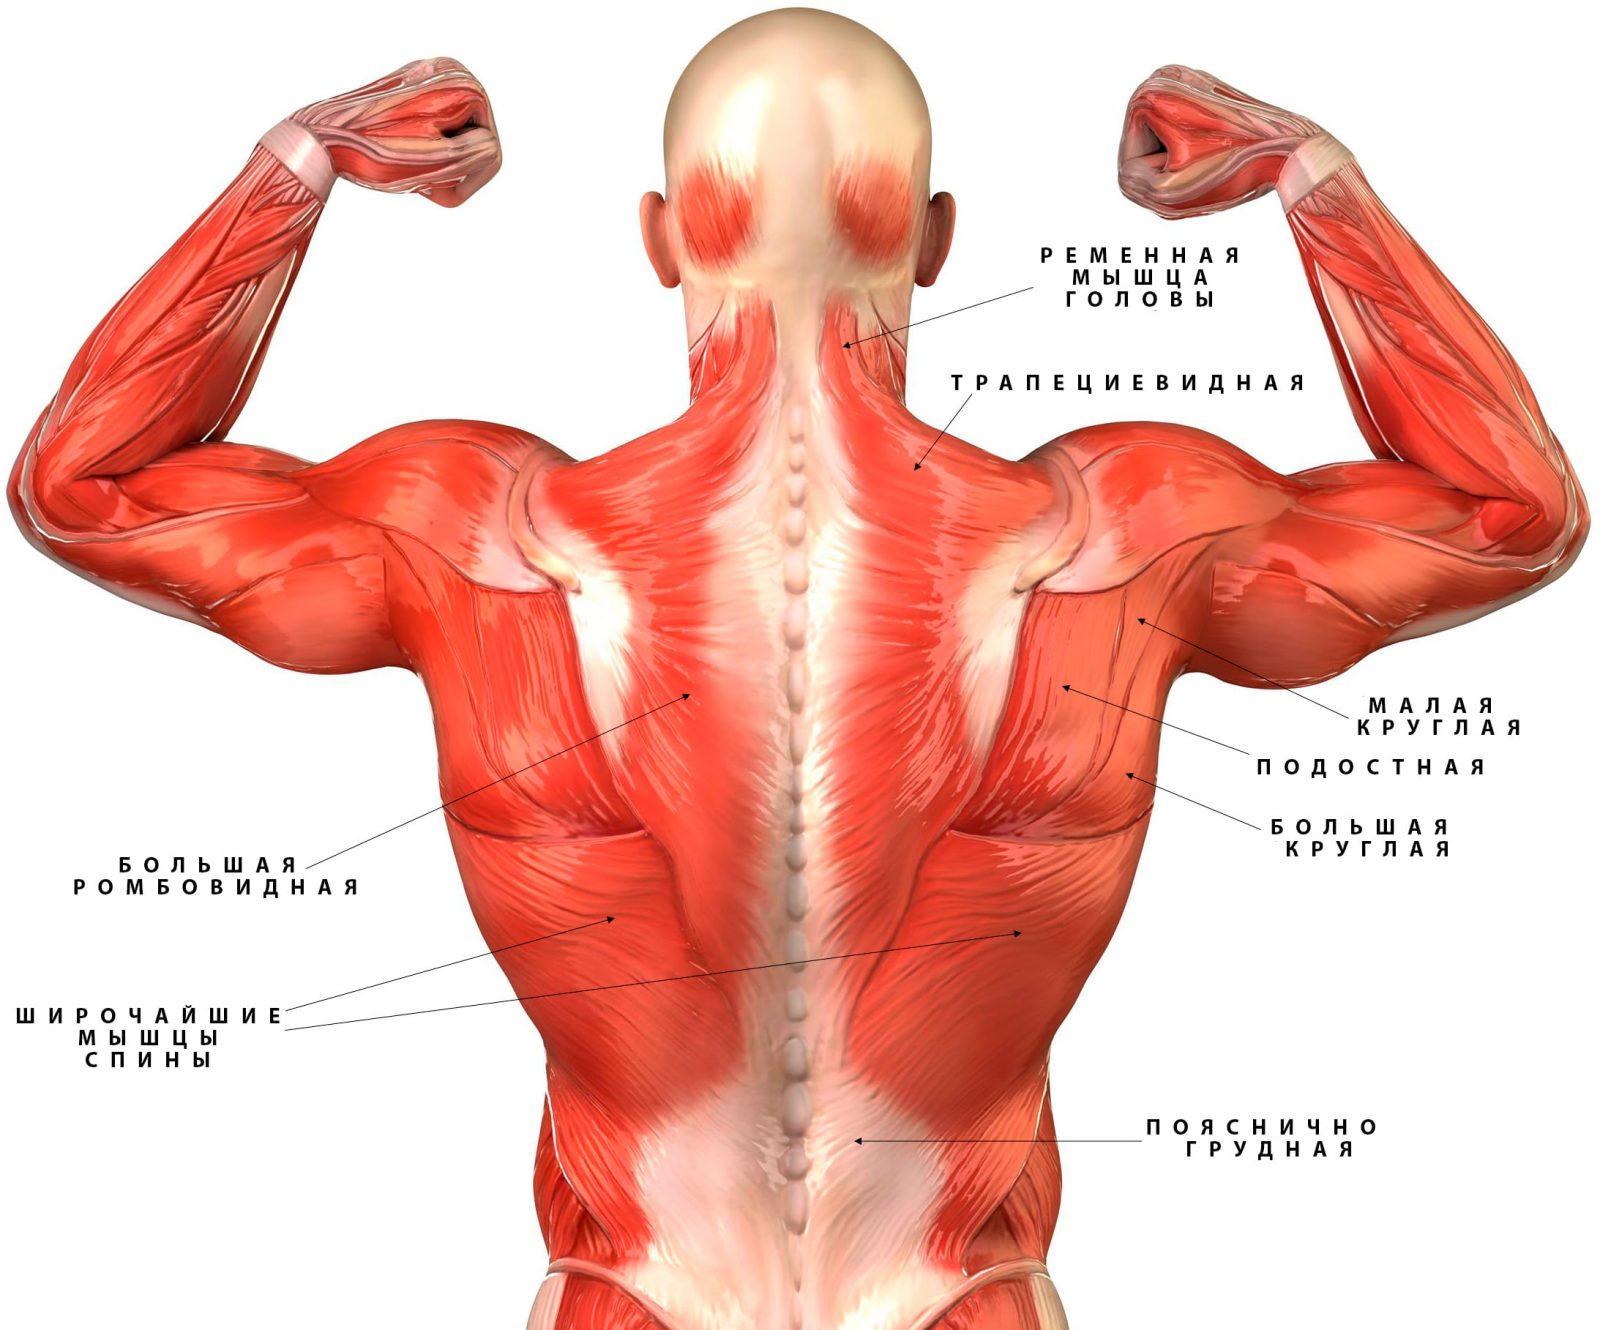 Анатомия скелетных мышц спины человека